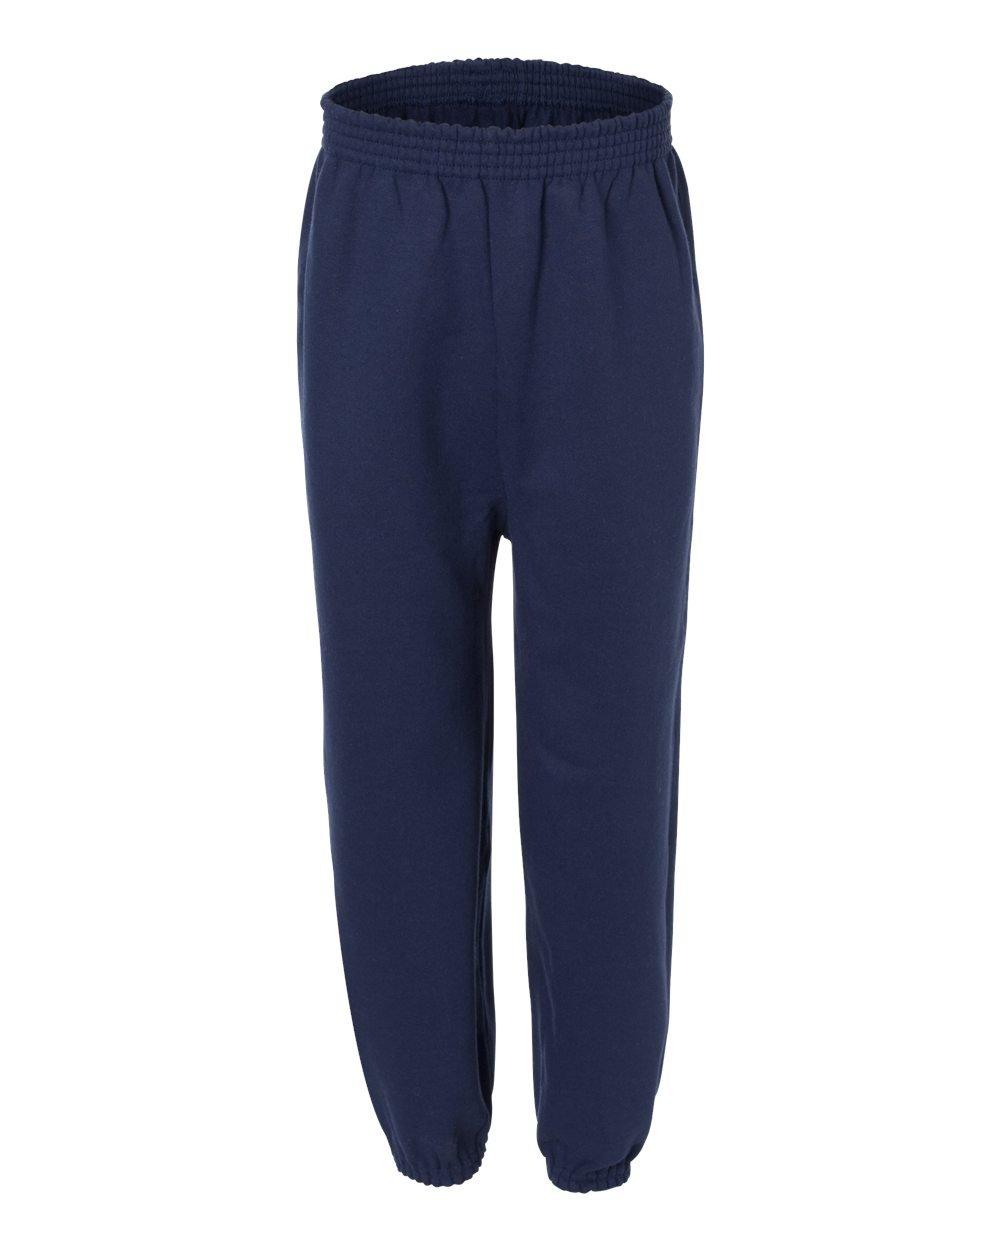 Hanes Youth ComfortBlend EcoSmart Sweatpants Deep Royal P450